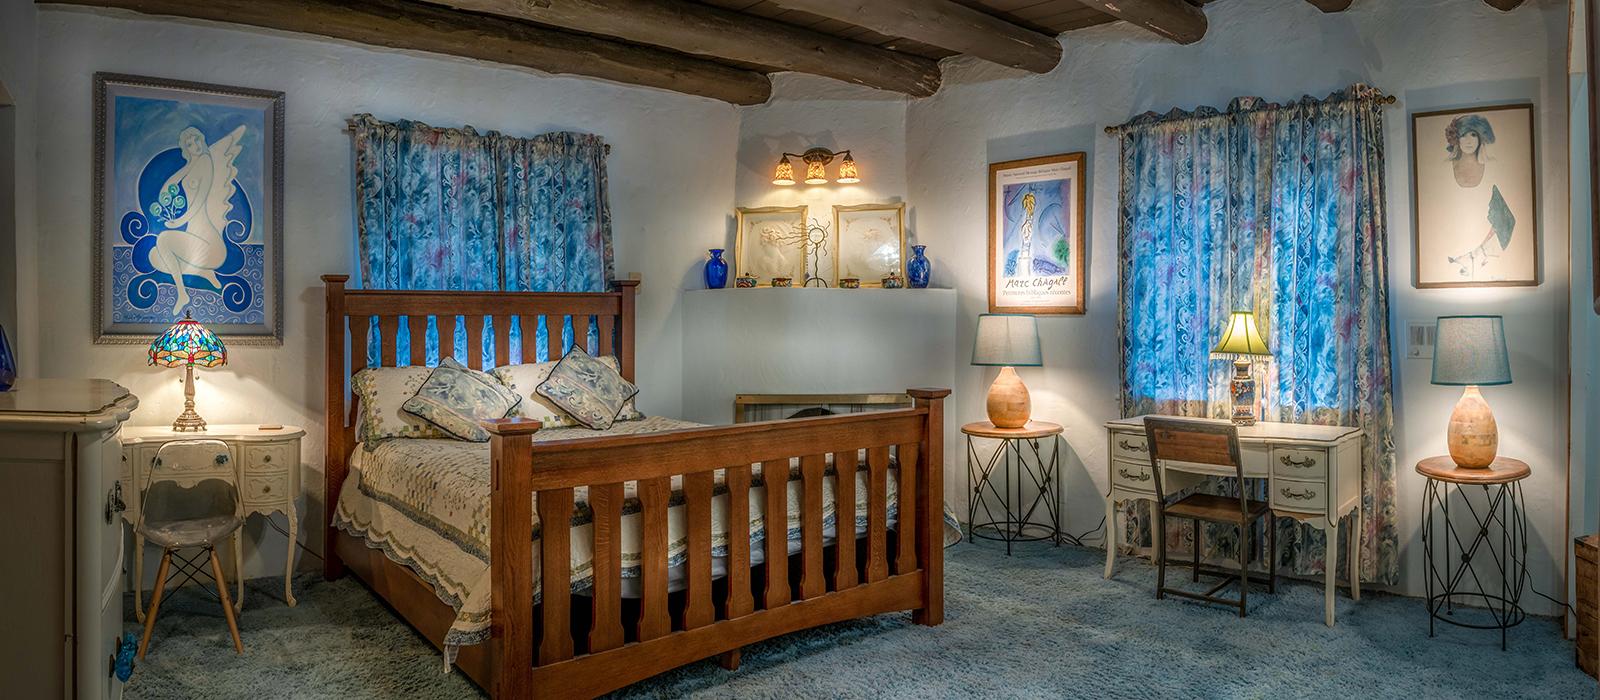 1600x700-housing-blueroom-left